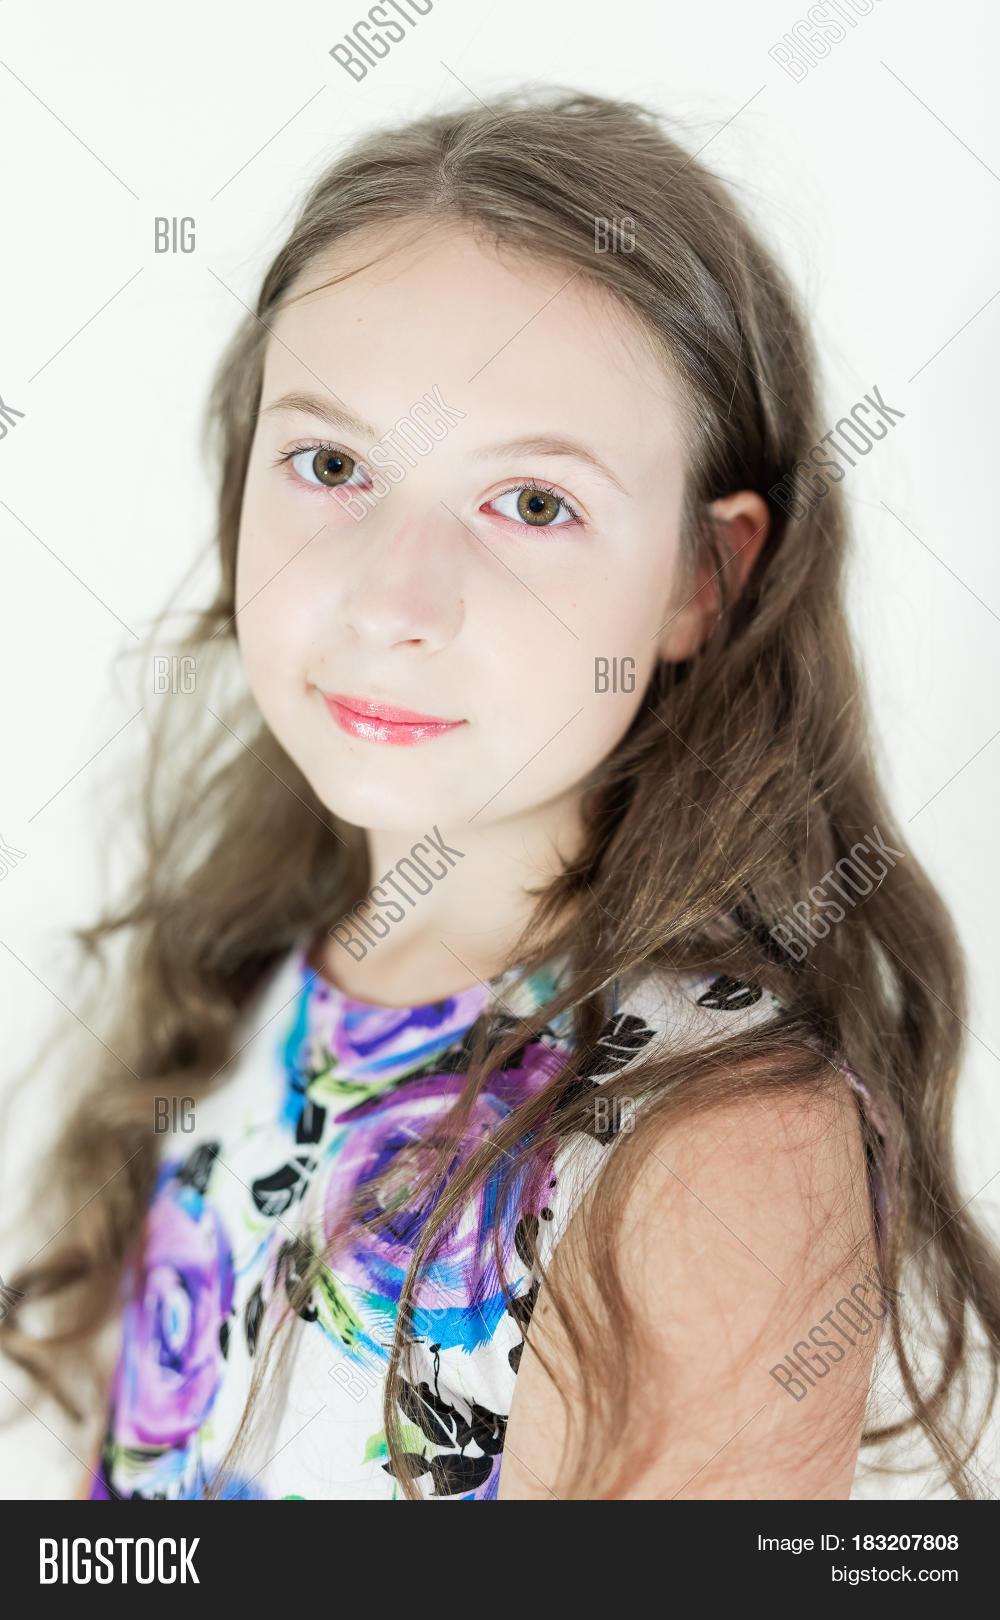 Cute teen girl portrait congratulate, seems